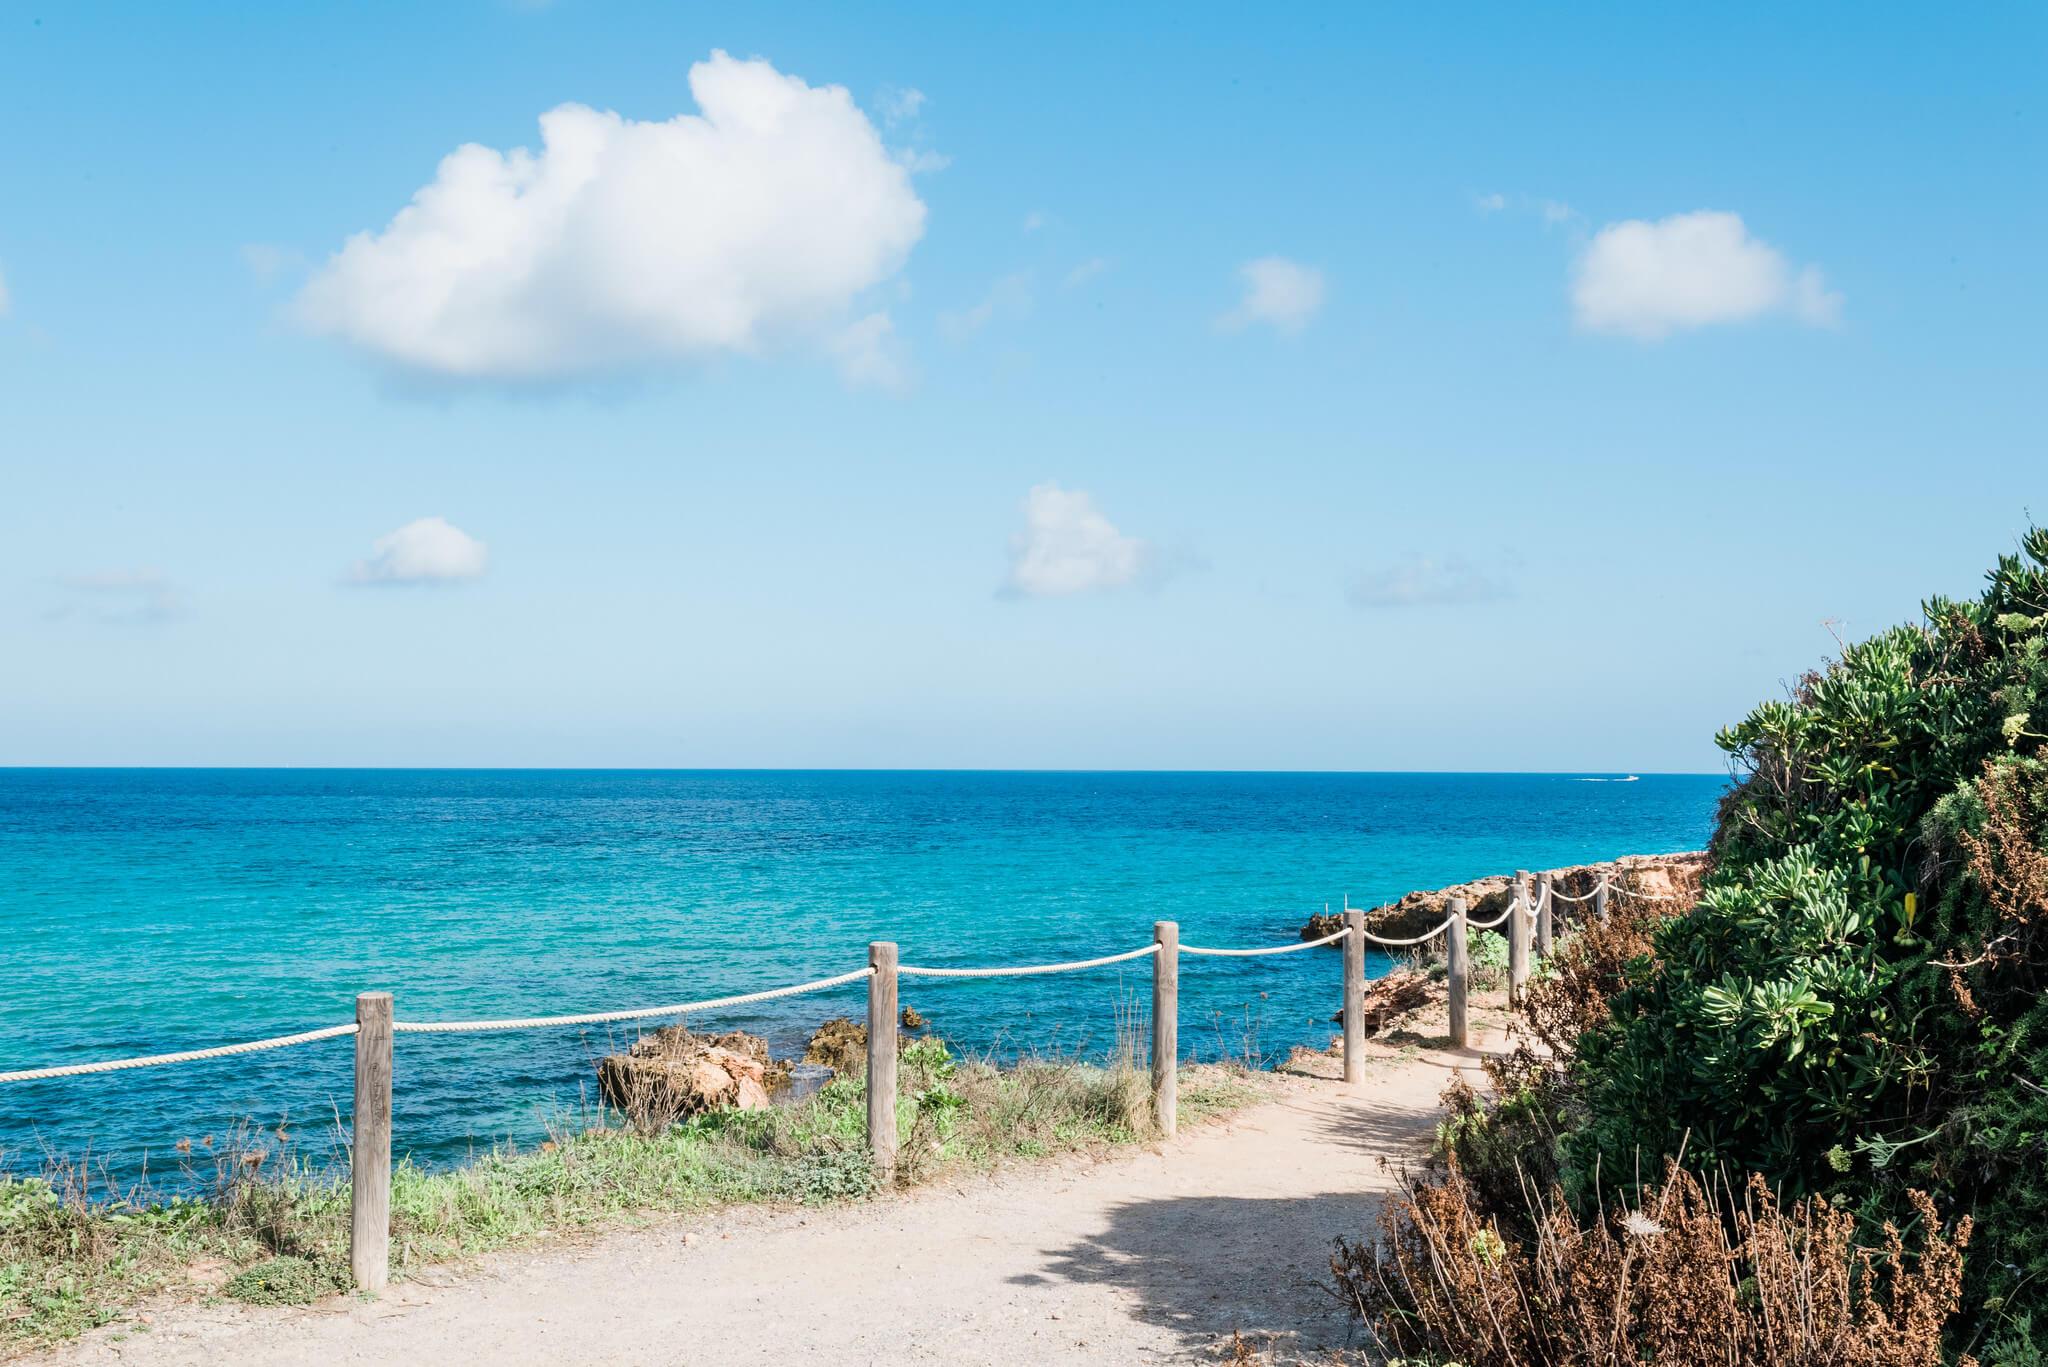 https://www.white-ibiza.com/wp-content/uploads/2020/03/ibiza-beaches-cala-nova-05.jpg